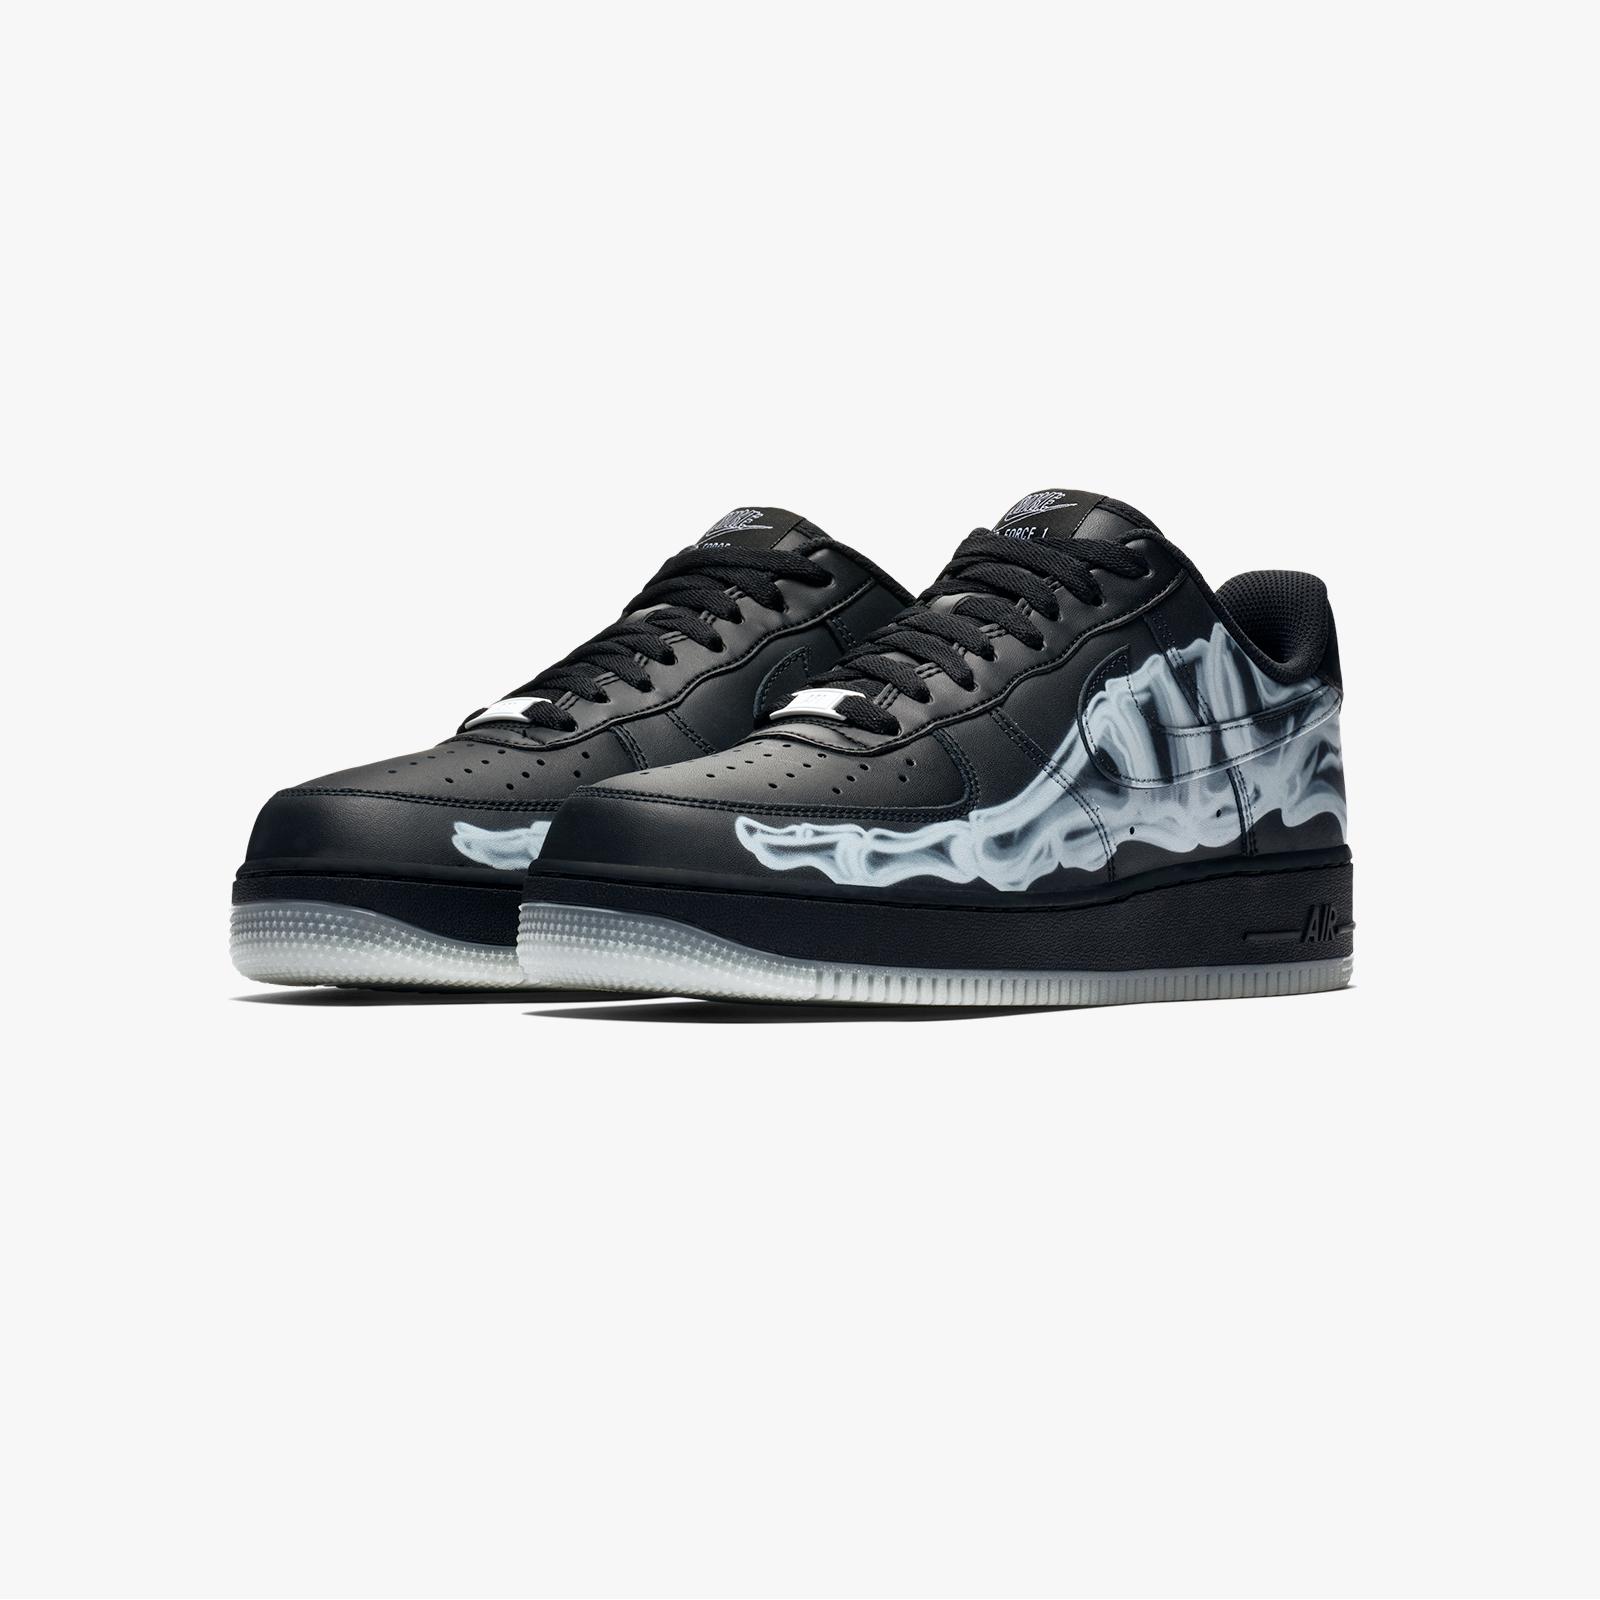 Nike Air Force 1 07 Skeleton QS Bq7541 001